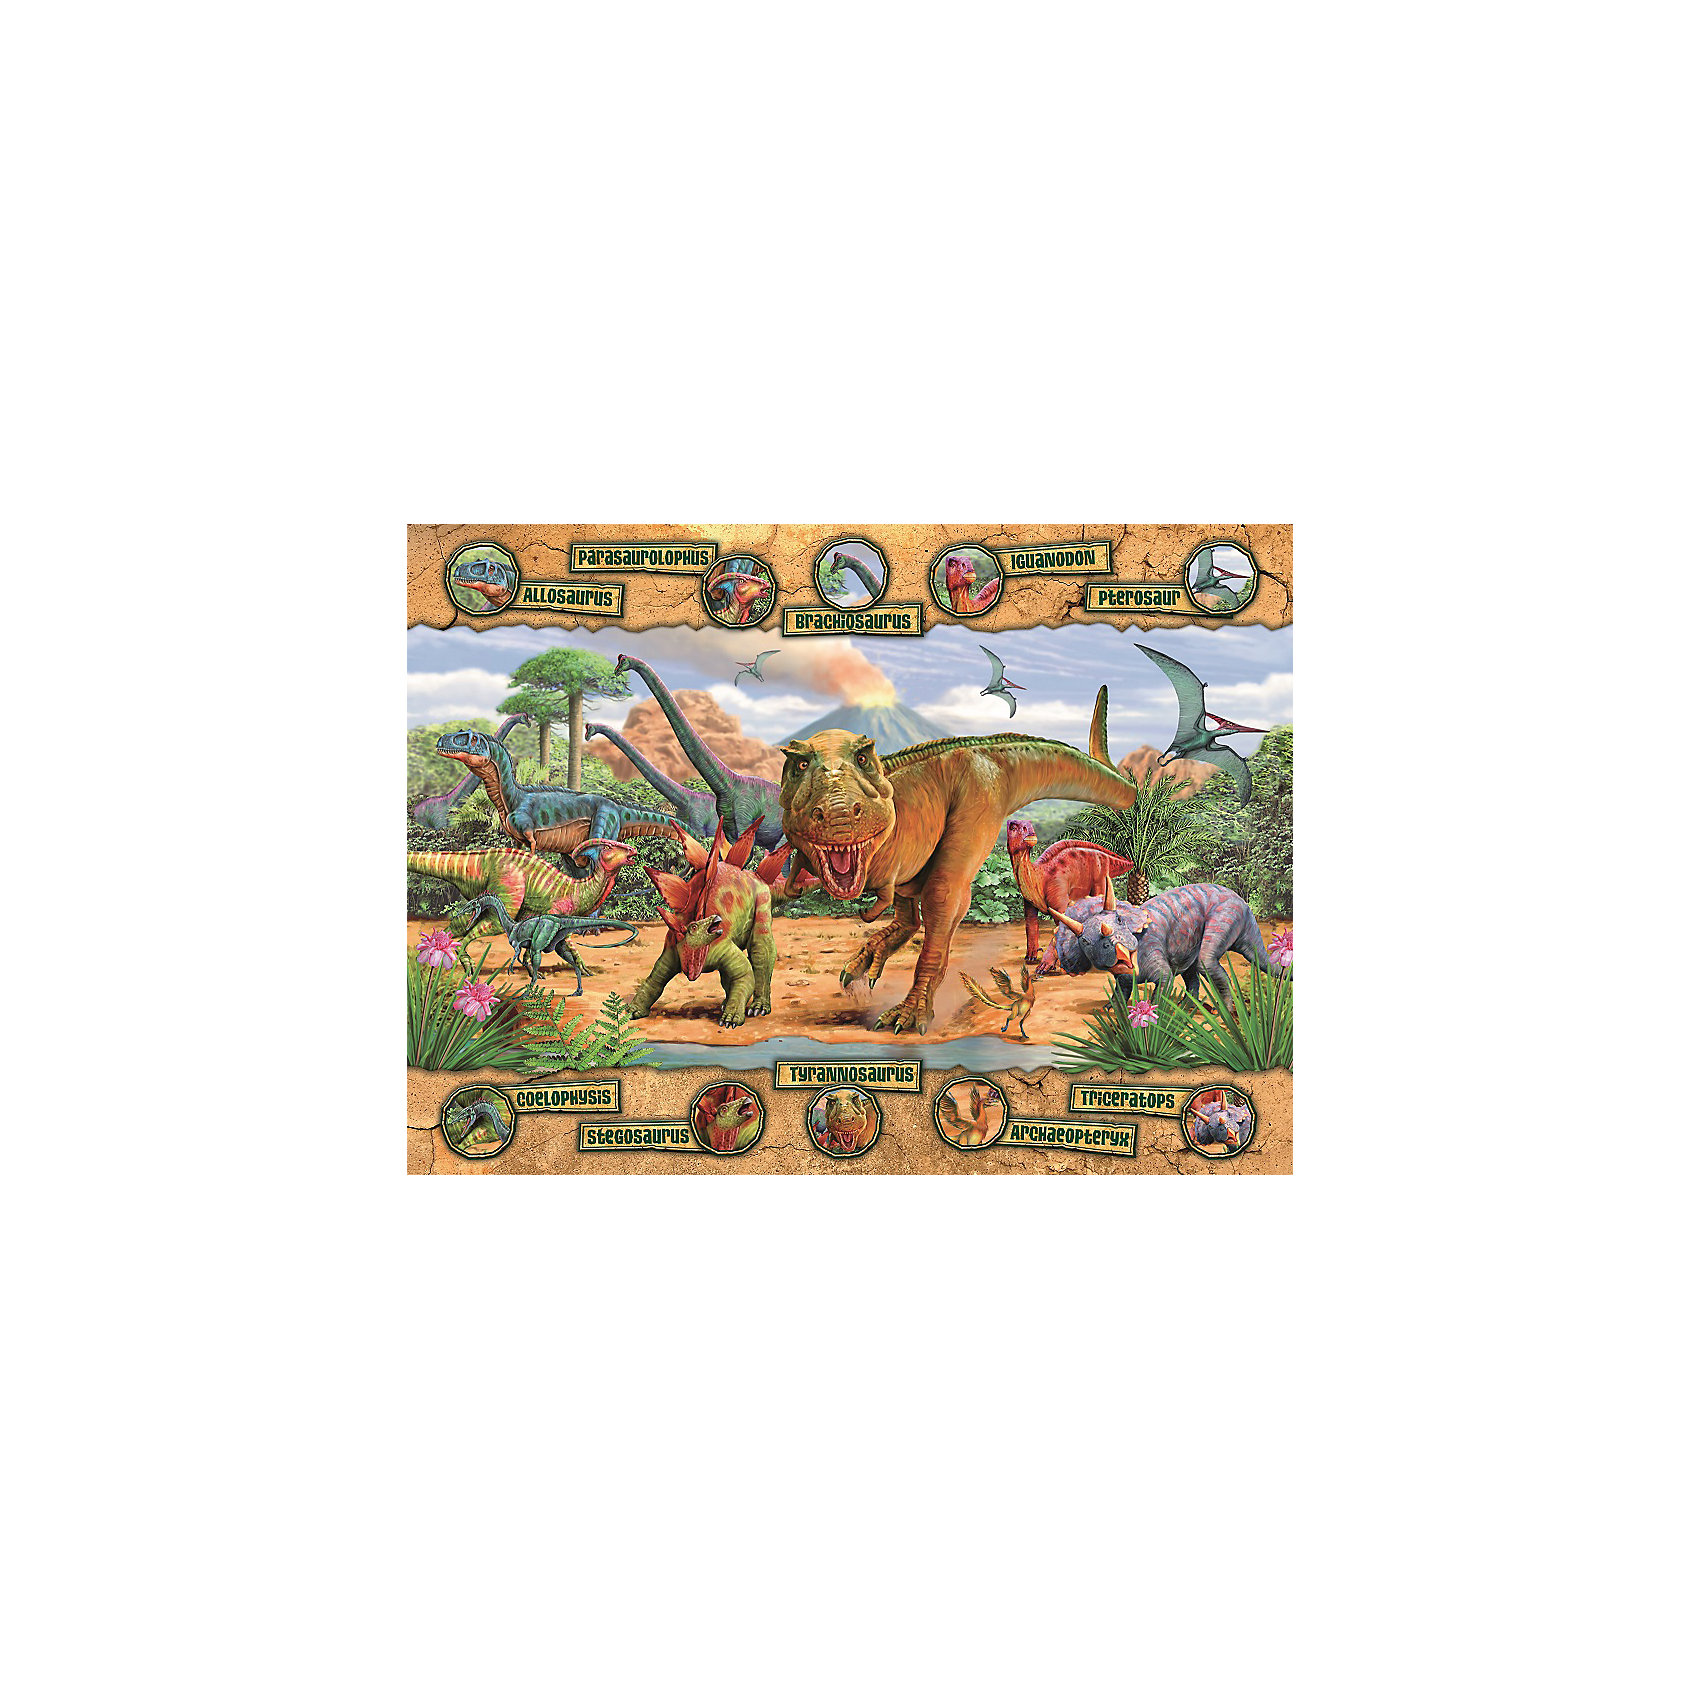 Ravensburger Пазл «Динозавры» XXL 100 деталей, Ravensburger ravensburger пазл скейтборды xxl 100 деталей